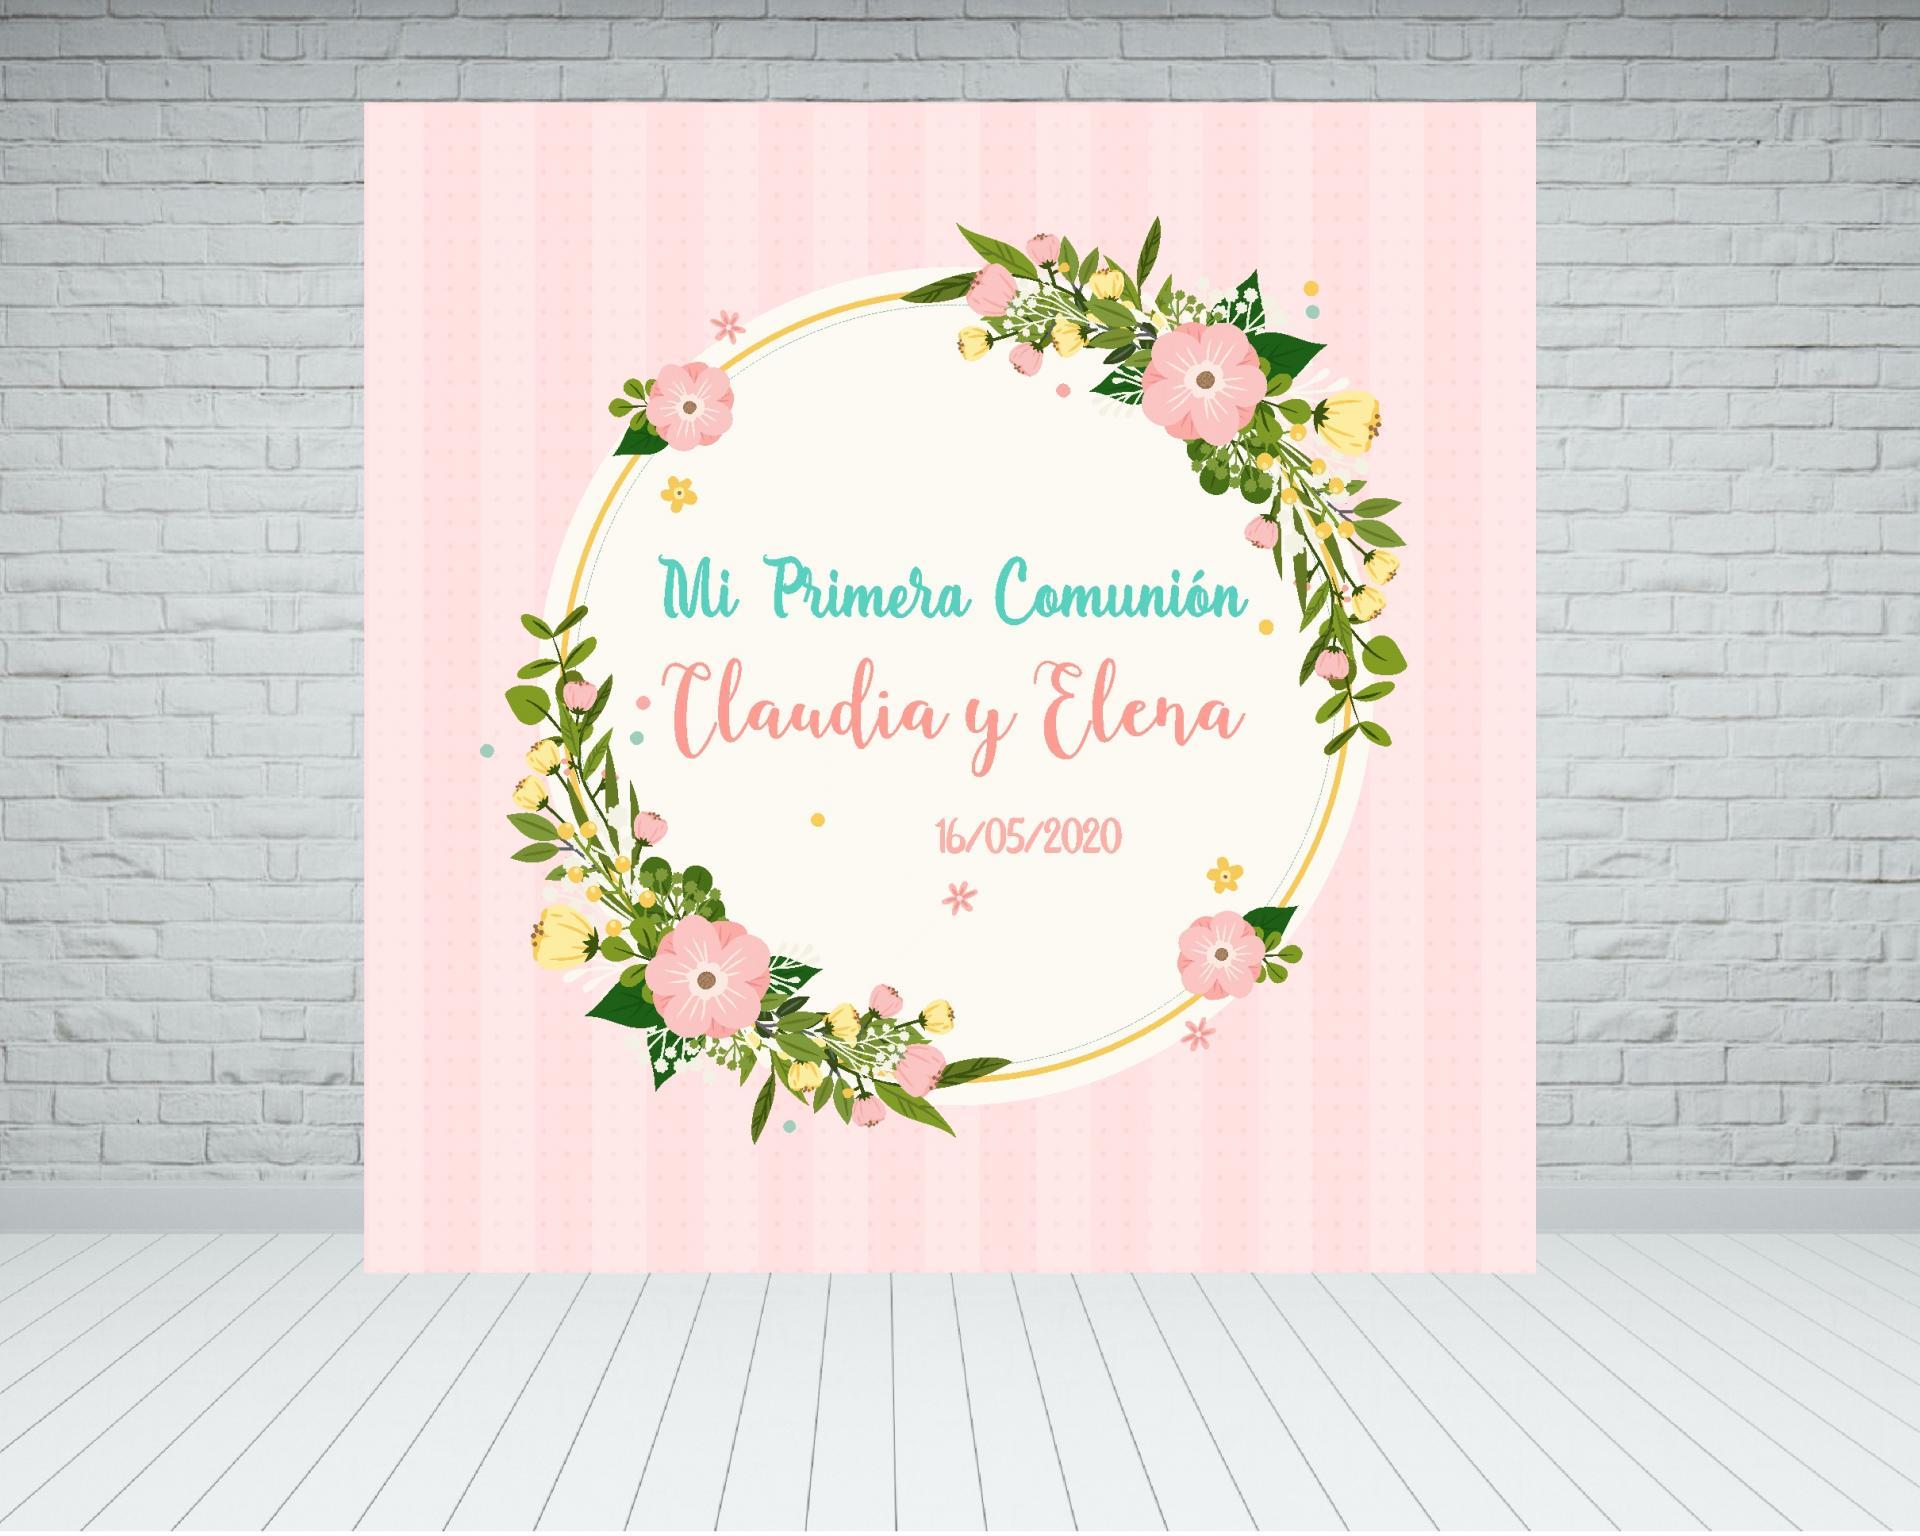 photocall-comunion-rosa